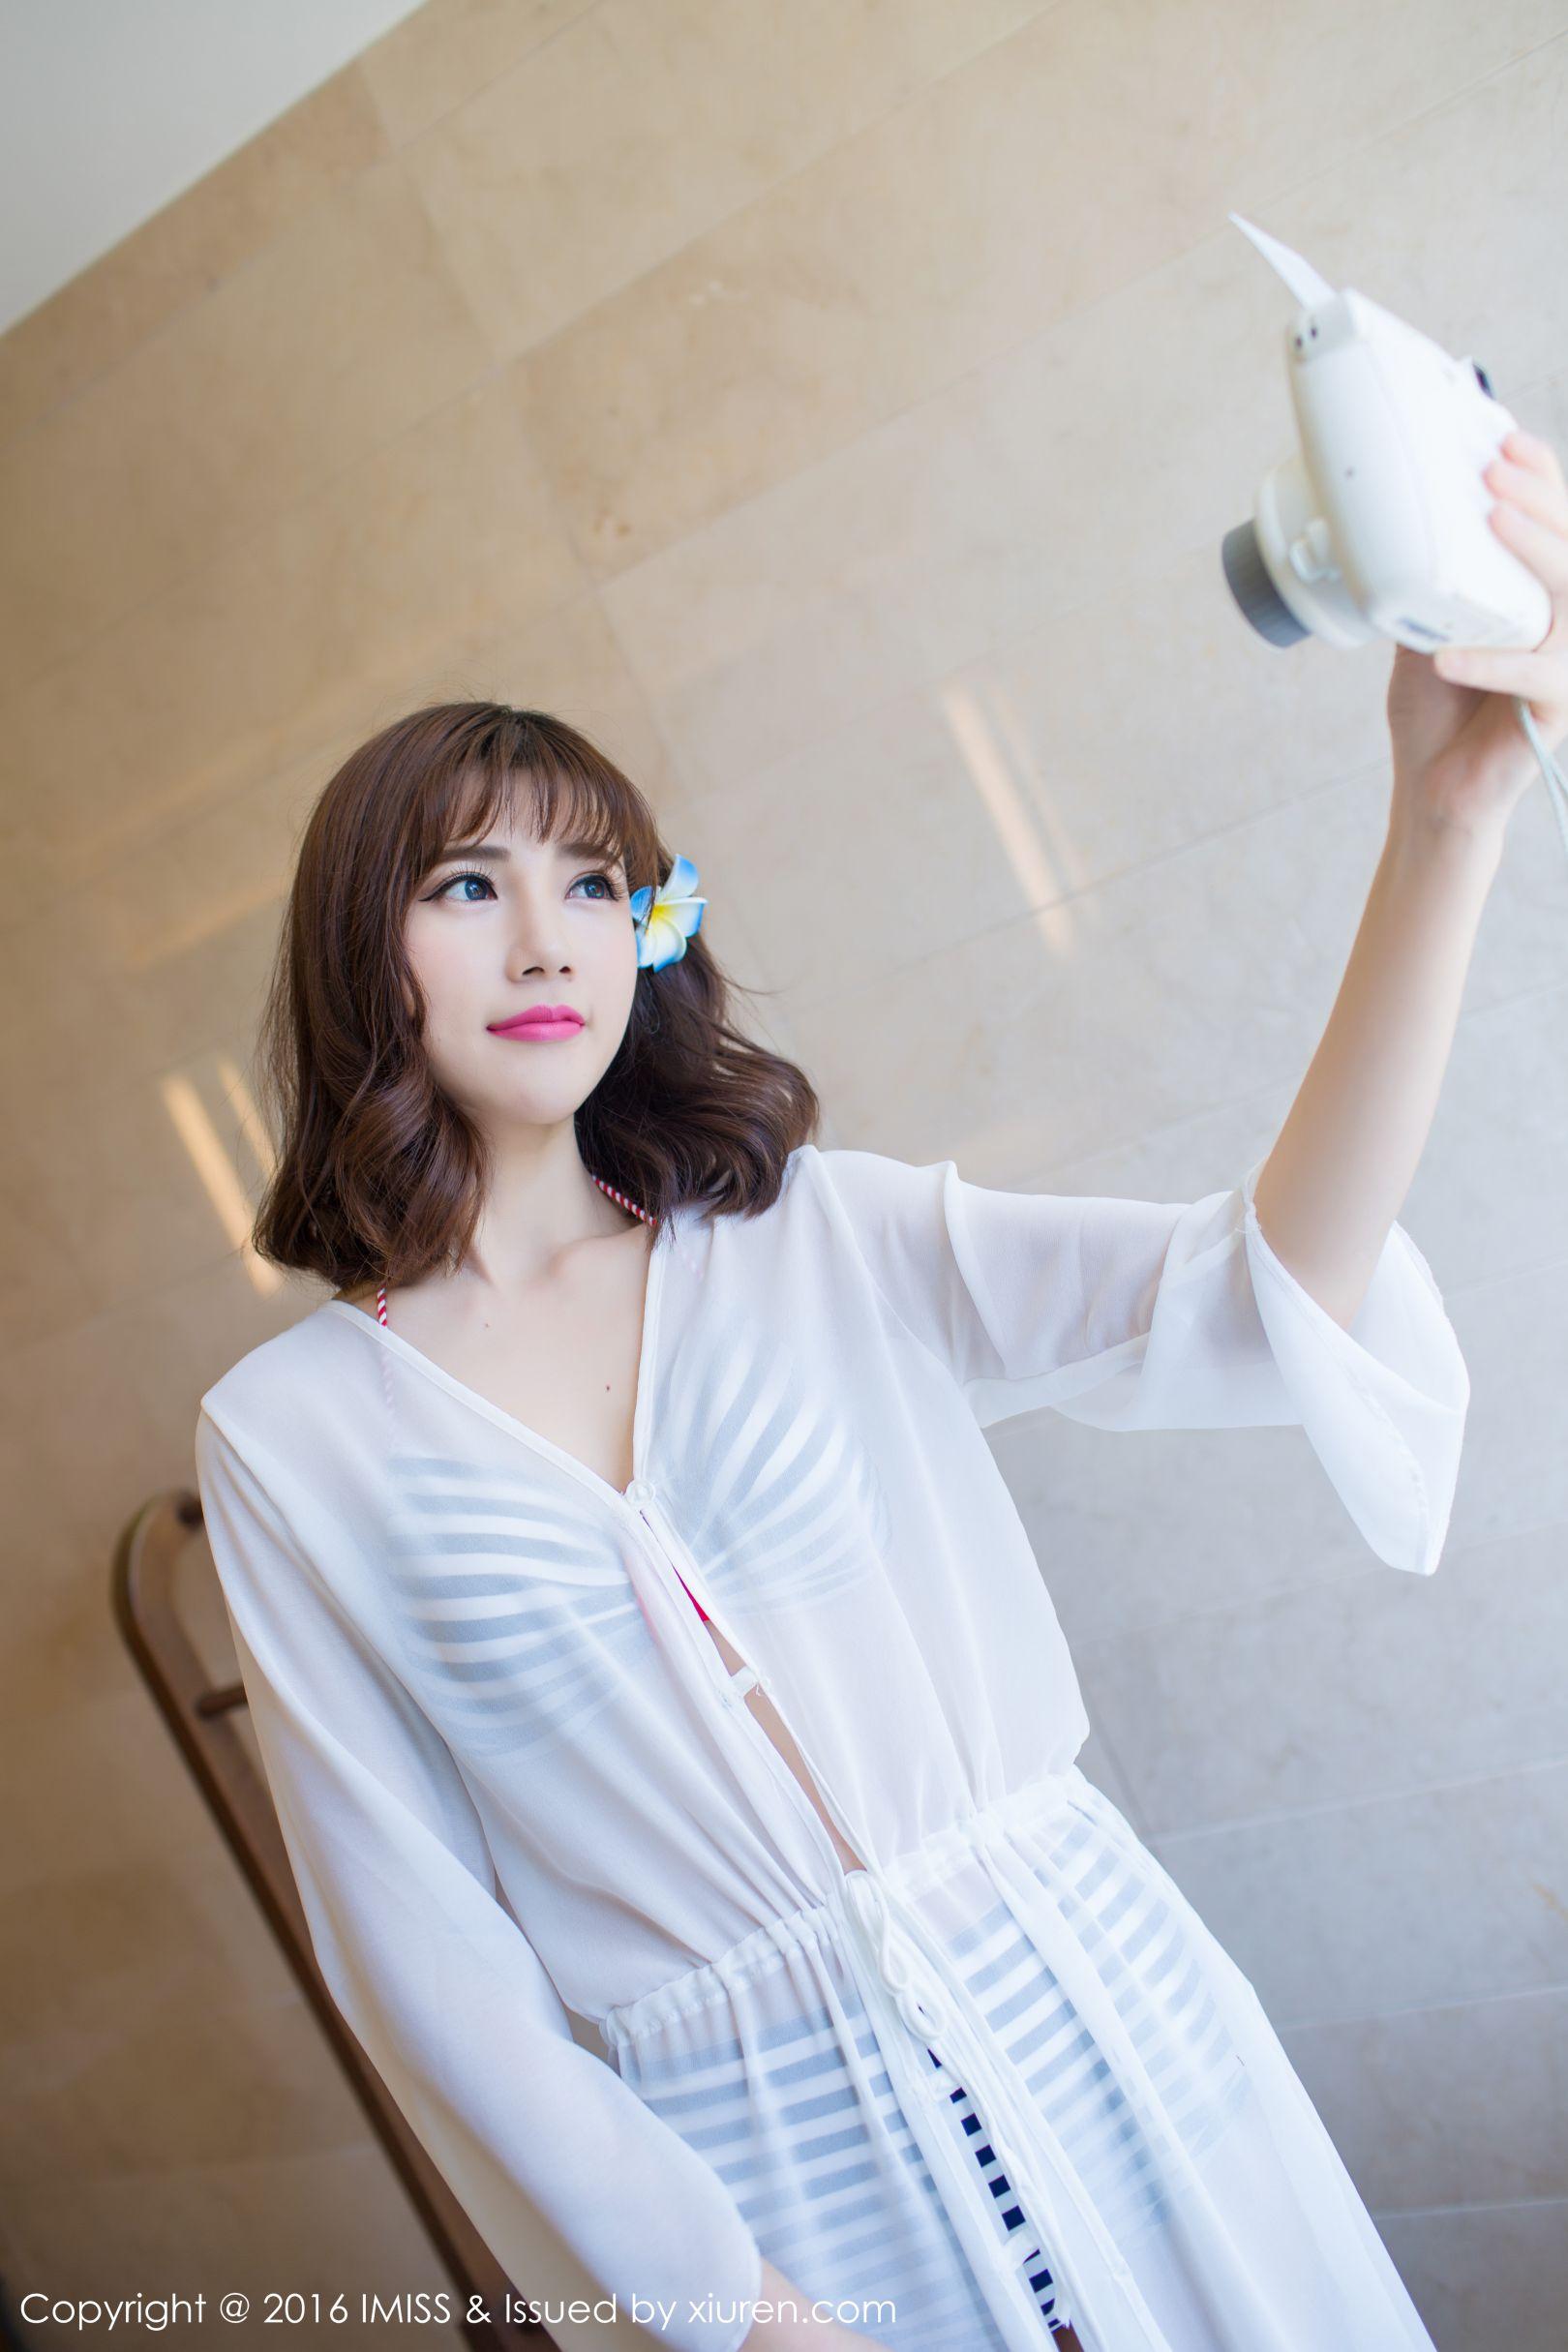 [IMiss 爱 蜜 社] Vol.083 Temperate Beauty @Sandy 陈天扬 兰卡威 旅 Shooting Photo